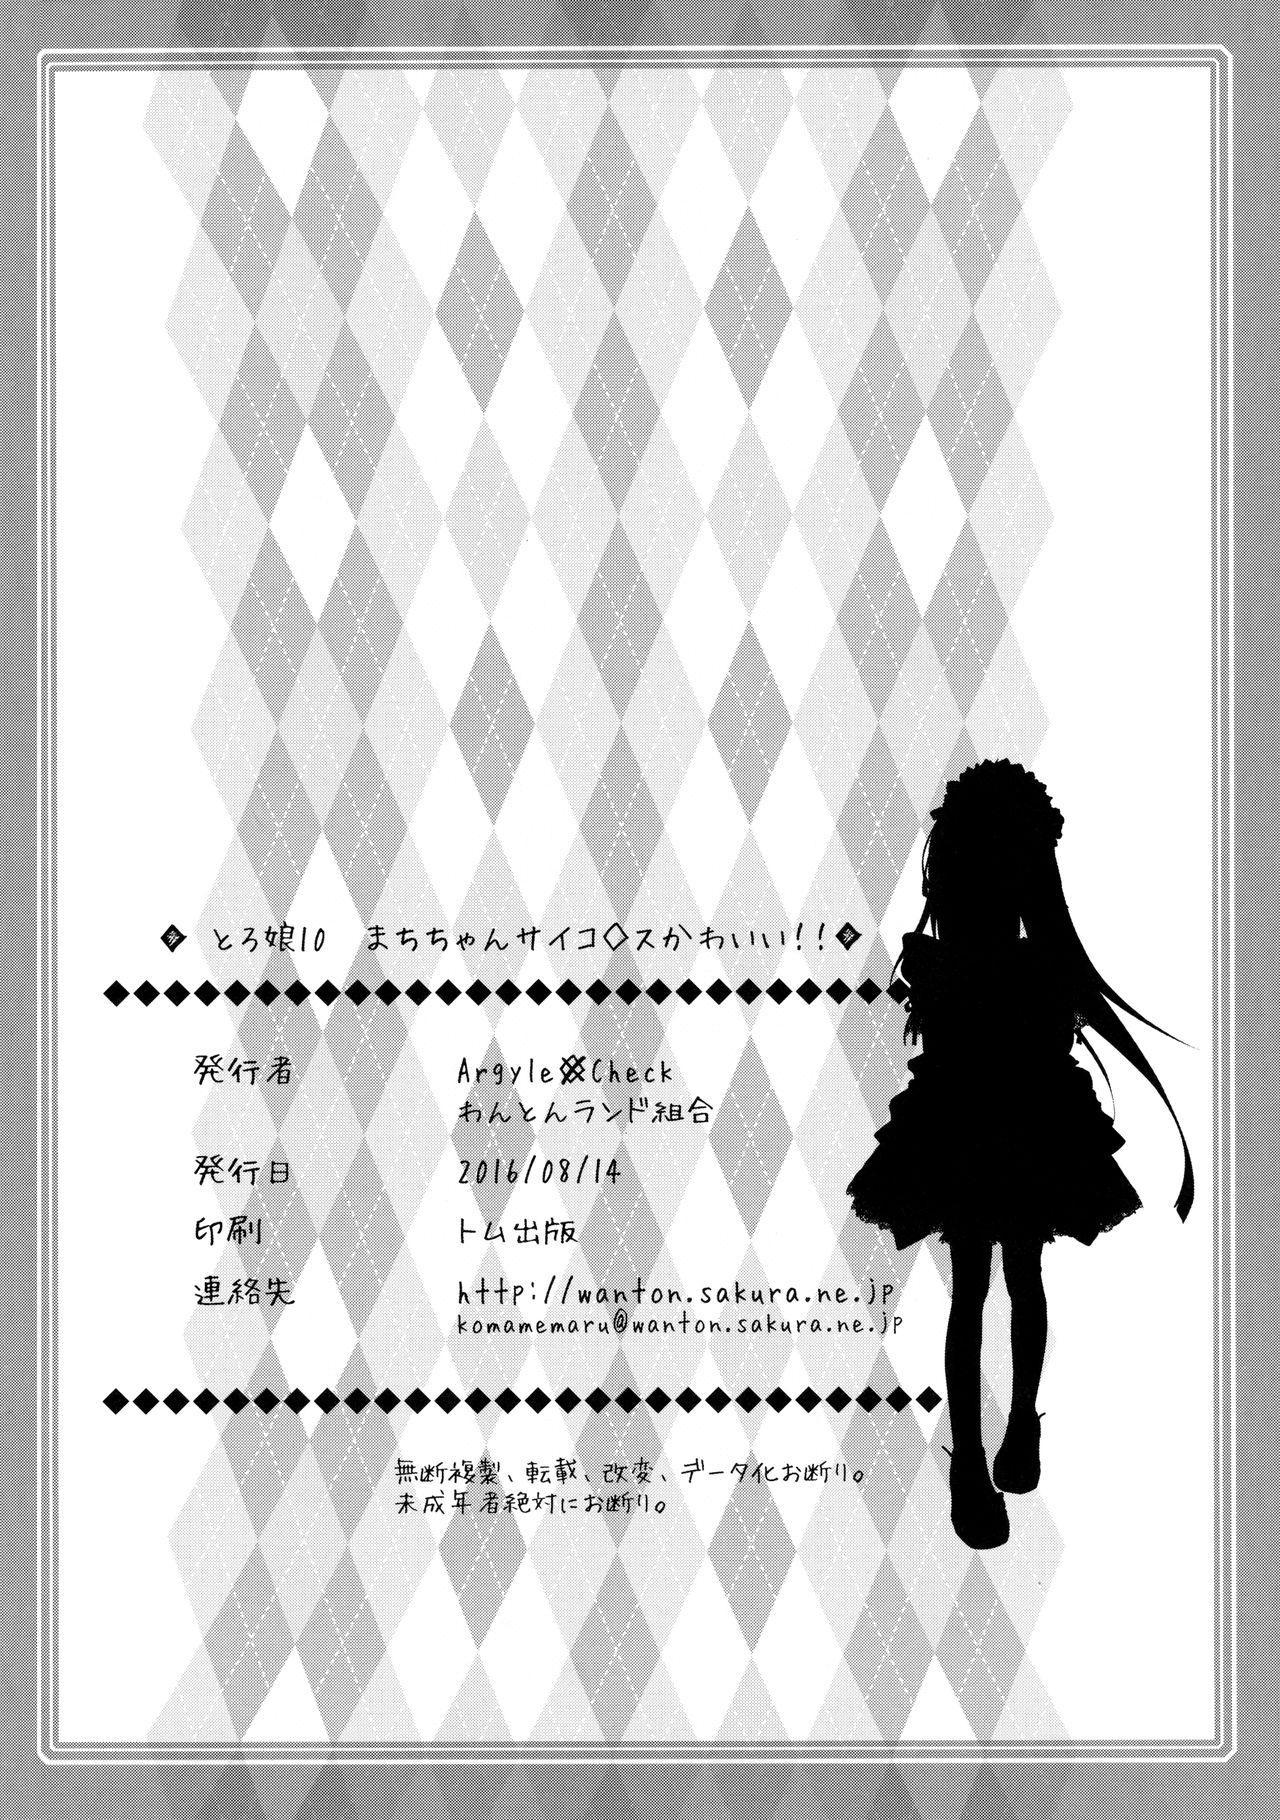 (C90) [Argyle check, Wanton Land Kumiai (Komame Maru)] Toro Musume 10 Machi-chan Psychopath Kawaii!!   Machi-chan is a Cute Psychopath!! (Kuma Miko) [English] [gravity666] 16